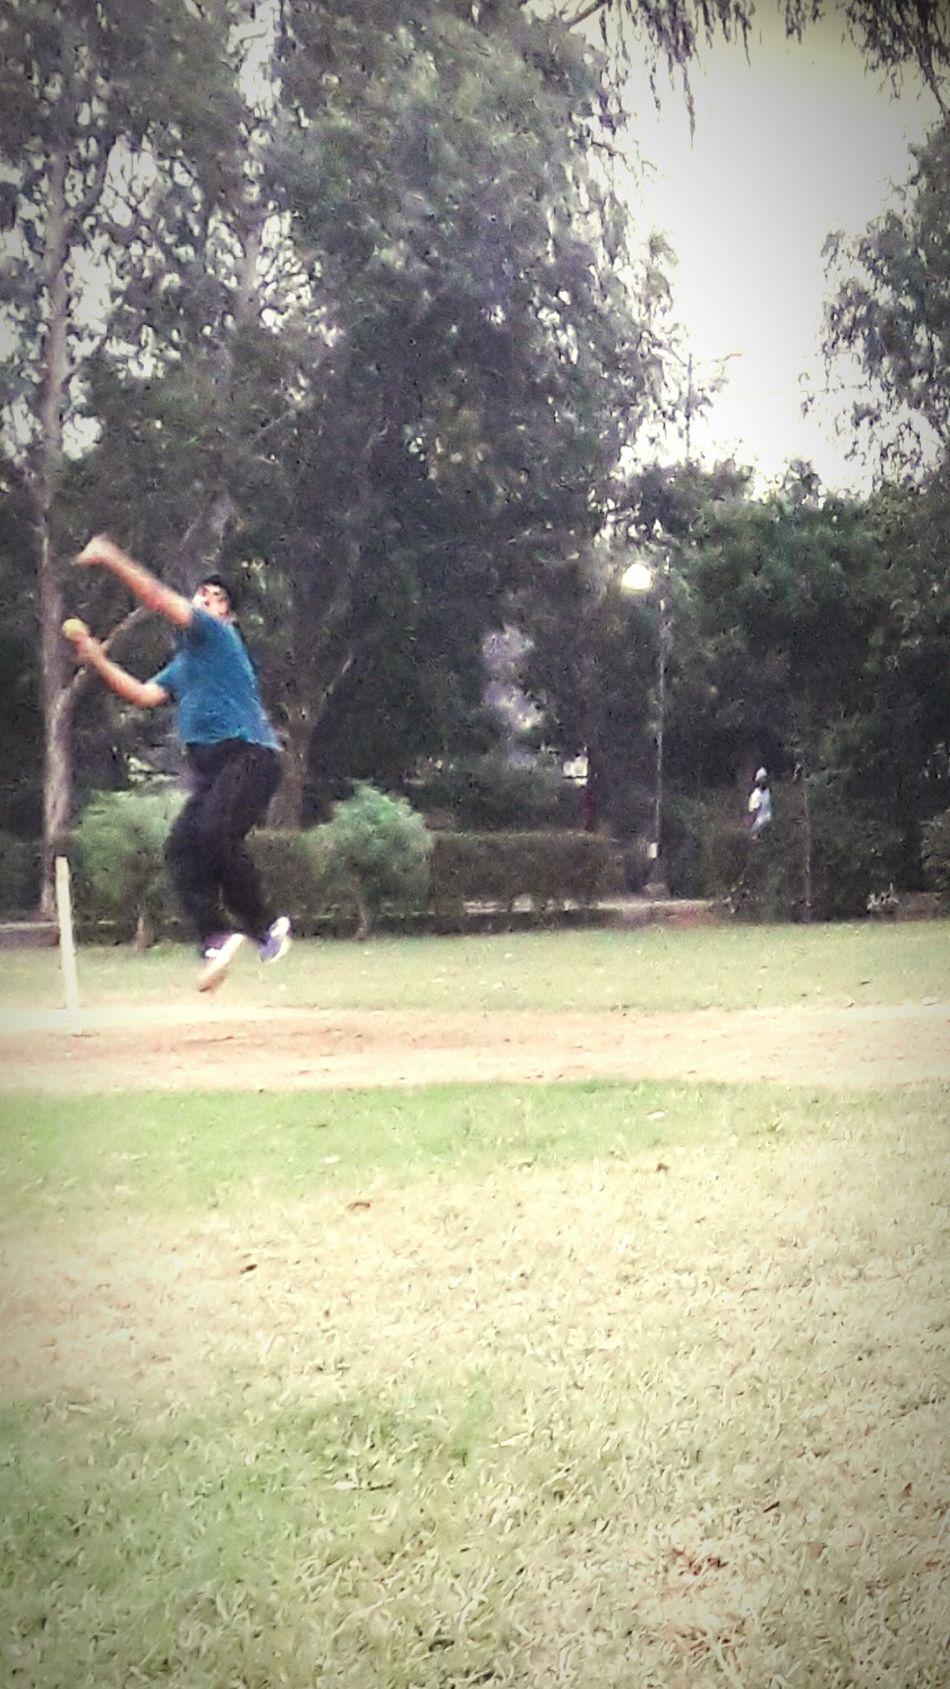 Sport In The City Cricketer Playing Cricket Sizedoesntmatter RespectGame EnjoyTheMoment Enjoyeverything LoveBowling